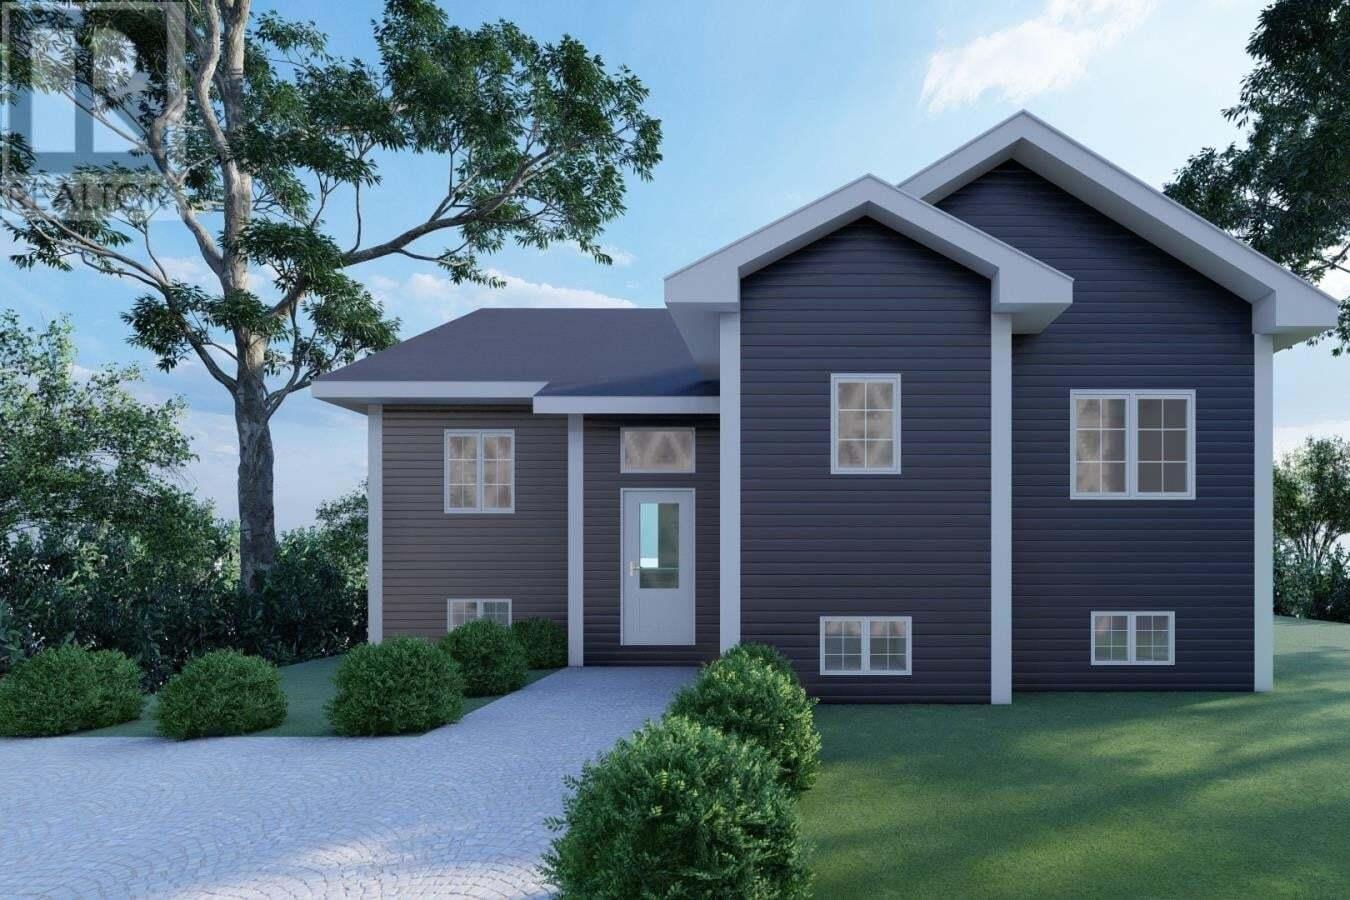 House for sale at 5 Pepperwood Dr St. John's Newfoundland - MLS: 1217339